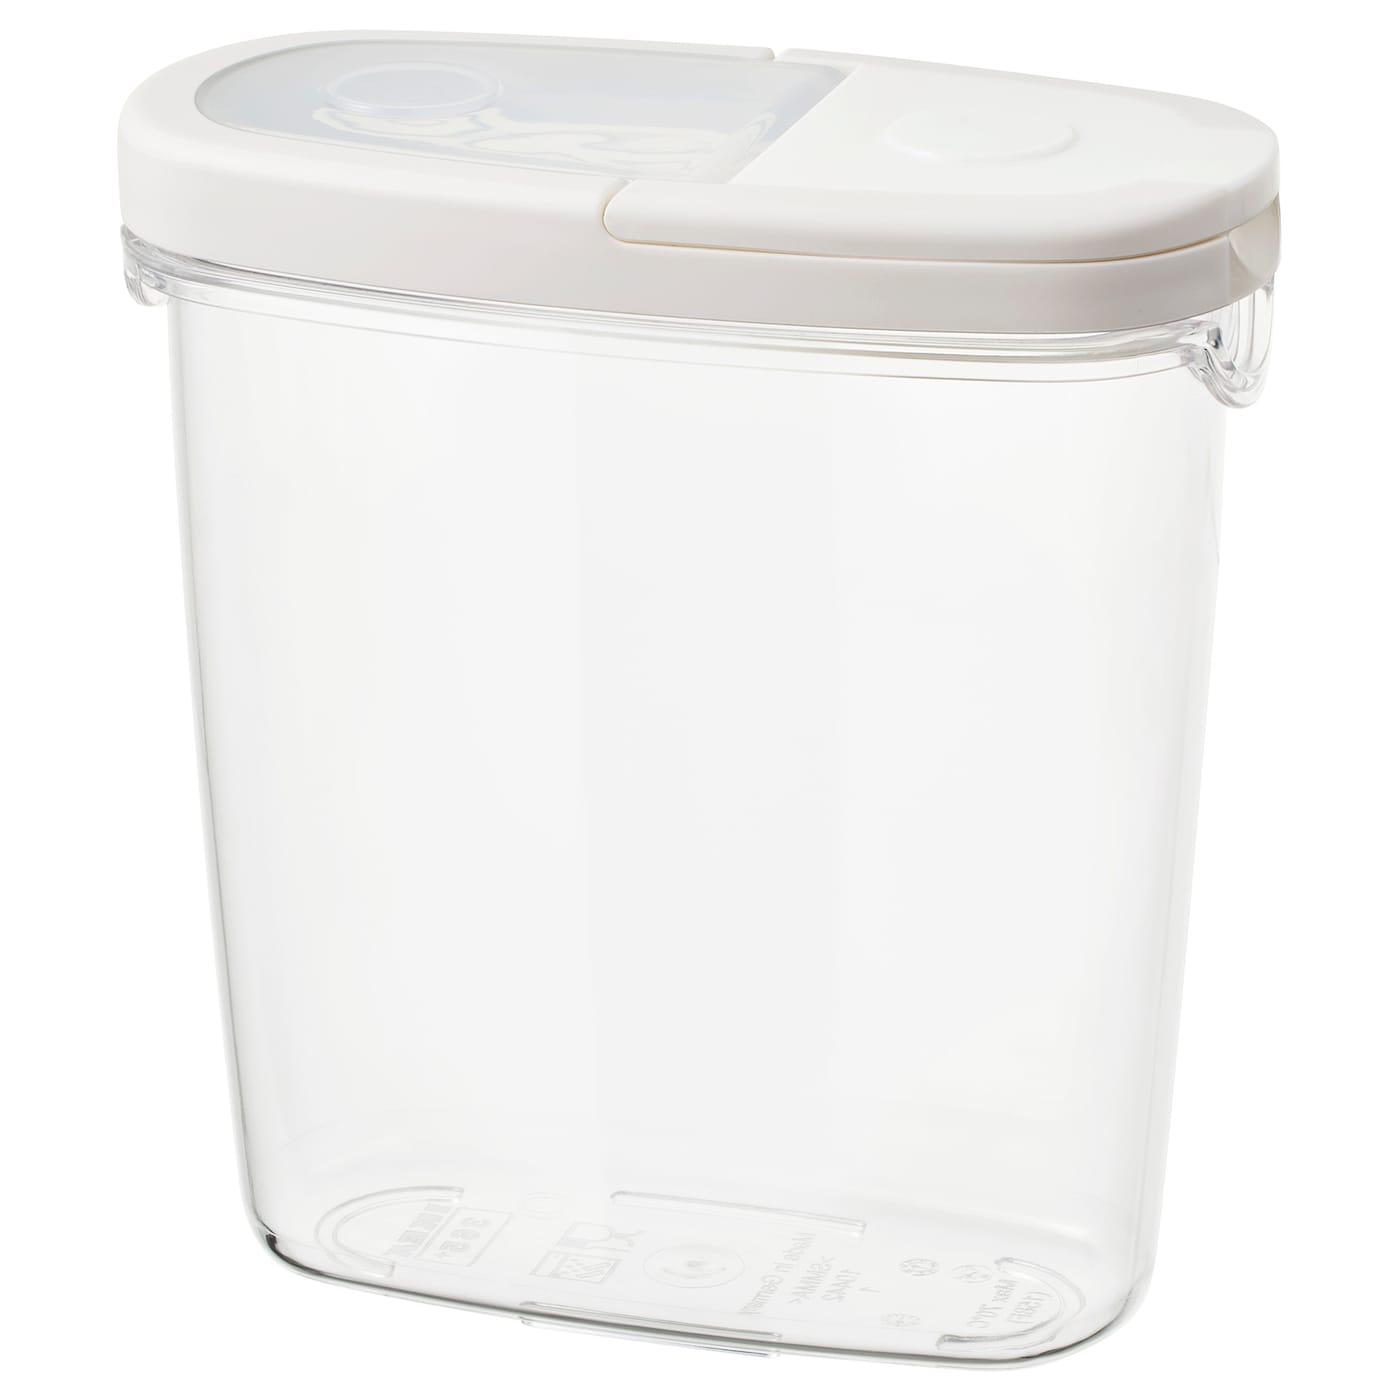 IKEA 365+ Bote ctapa transparenteblanco 1.3 l